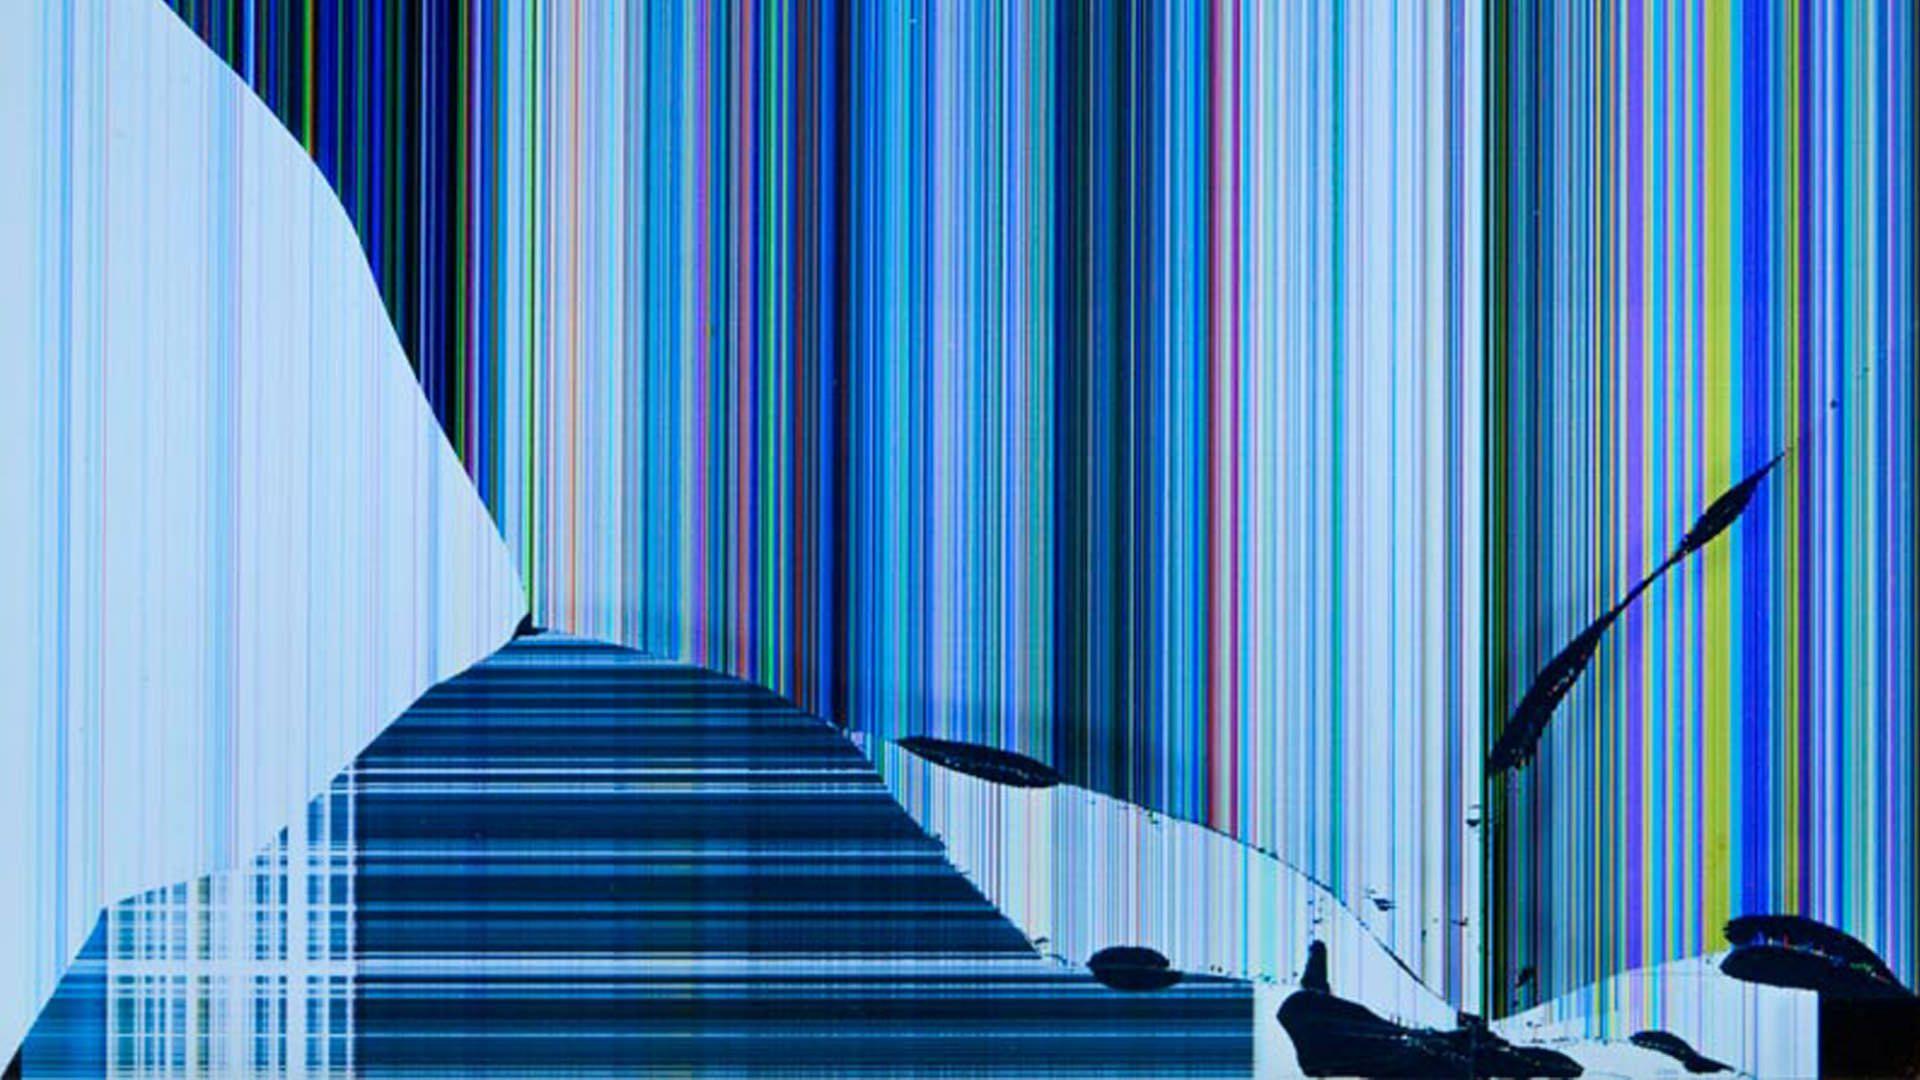 Google Image Result For Https I Pinimg Com Originals Ff 0f 19 Ff0f19b4324553b2f796e3cb3 Broken Screen Wallpaper Computer Screen Wallpaper Screen Wallpaper Hd